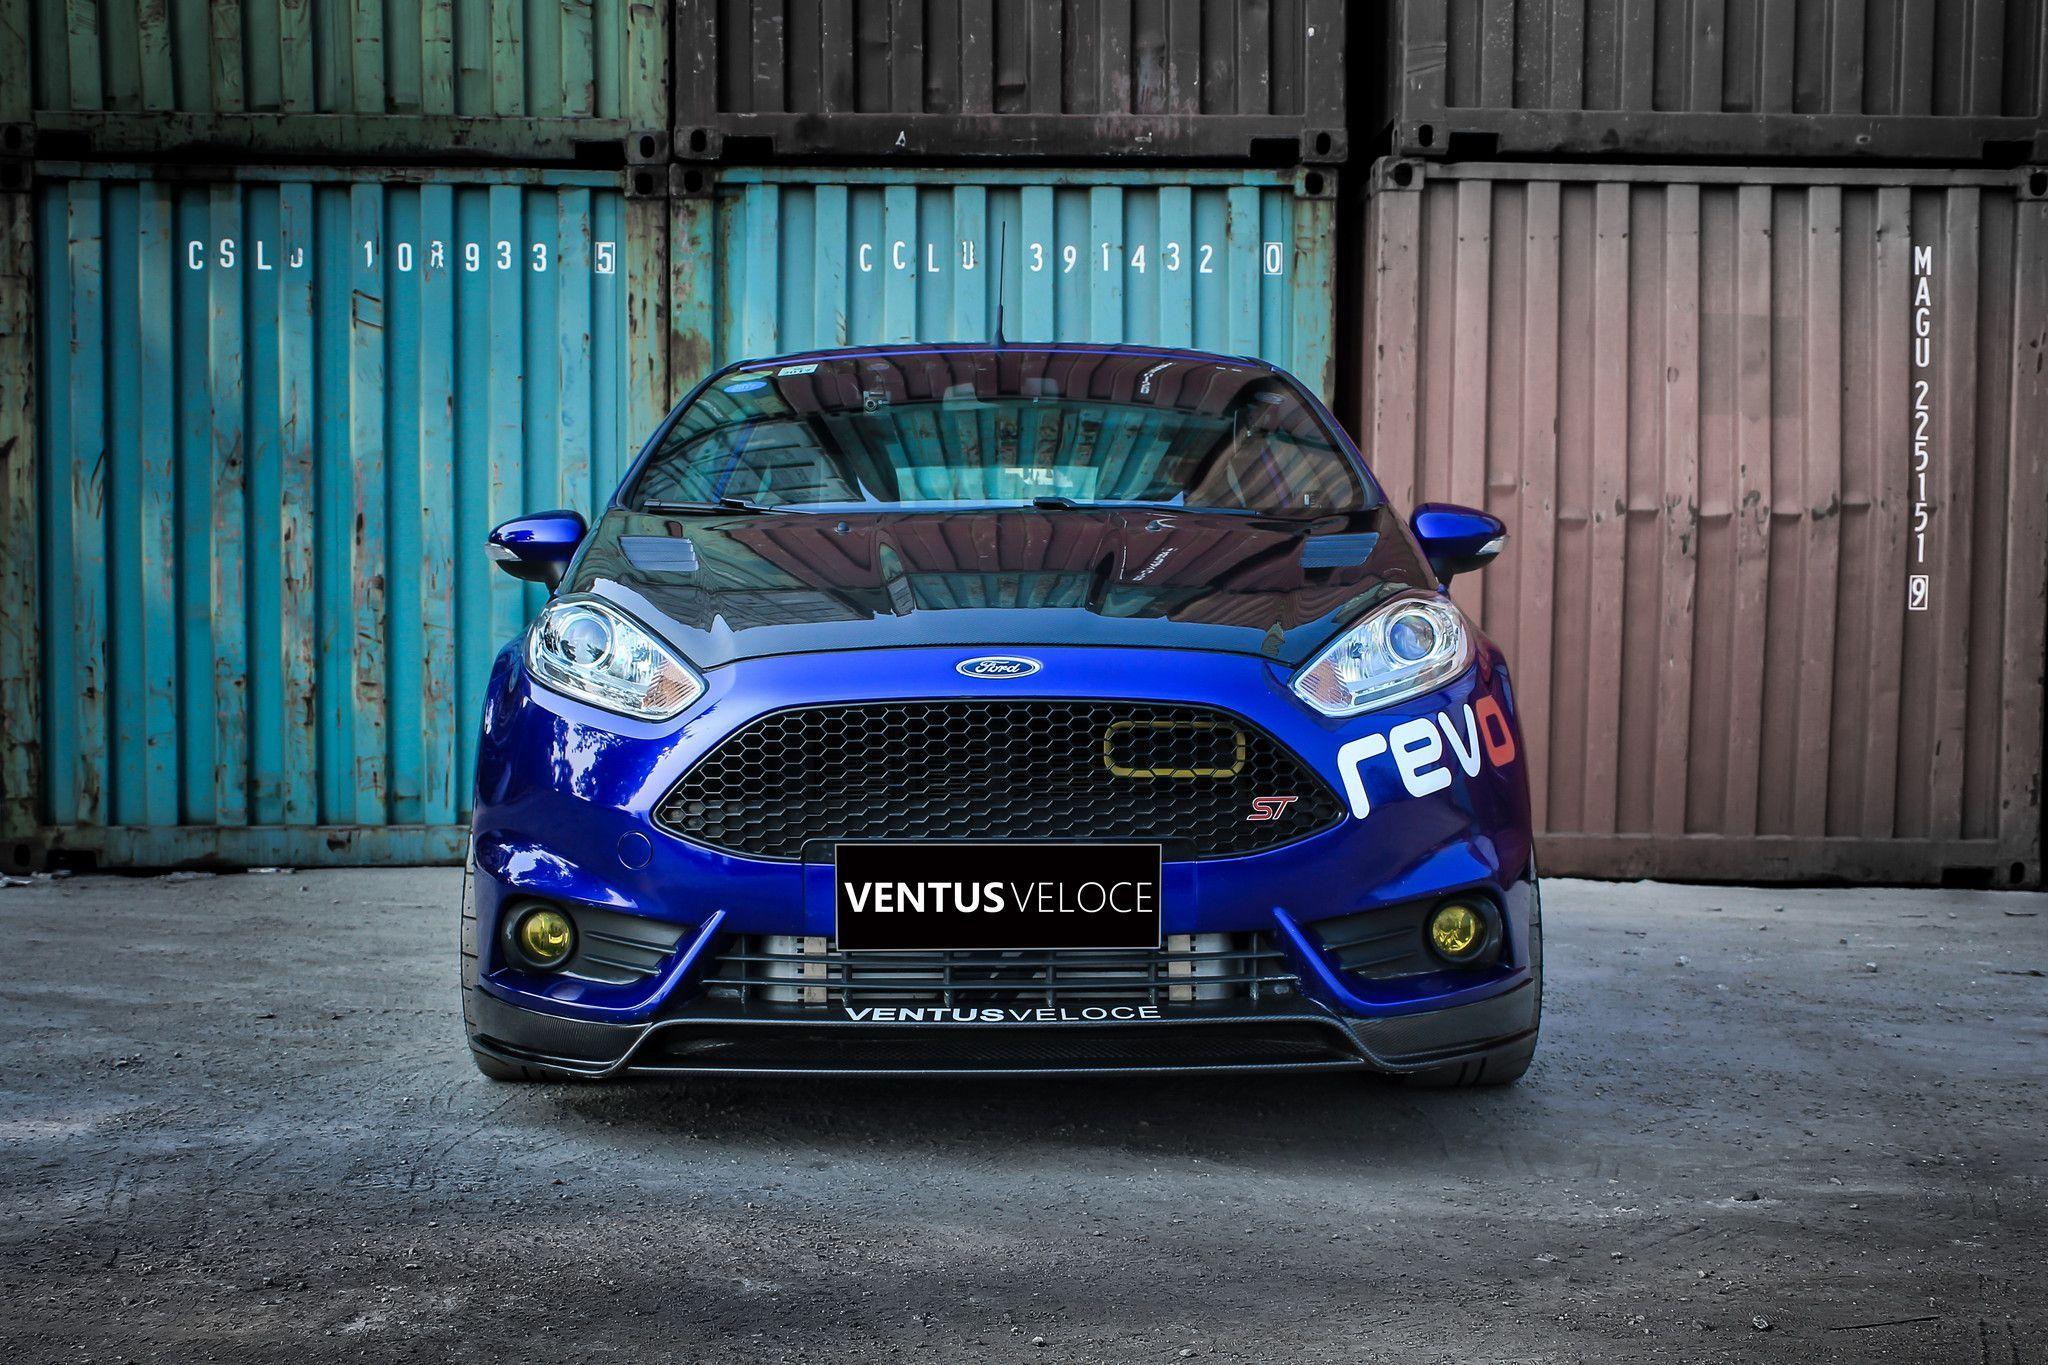 2014 2017 Ford Fiesta St Chin Spoiler Ford Fiesta St Fiesta St